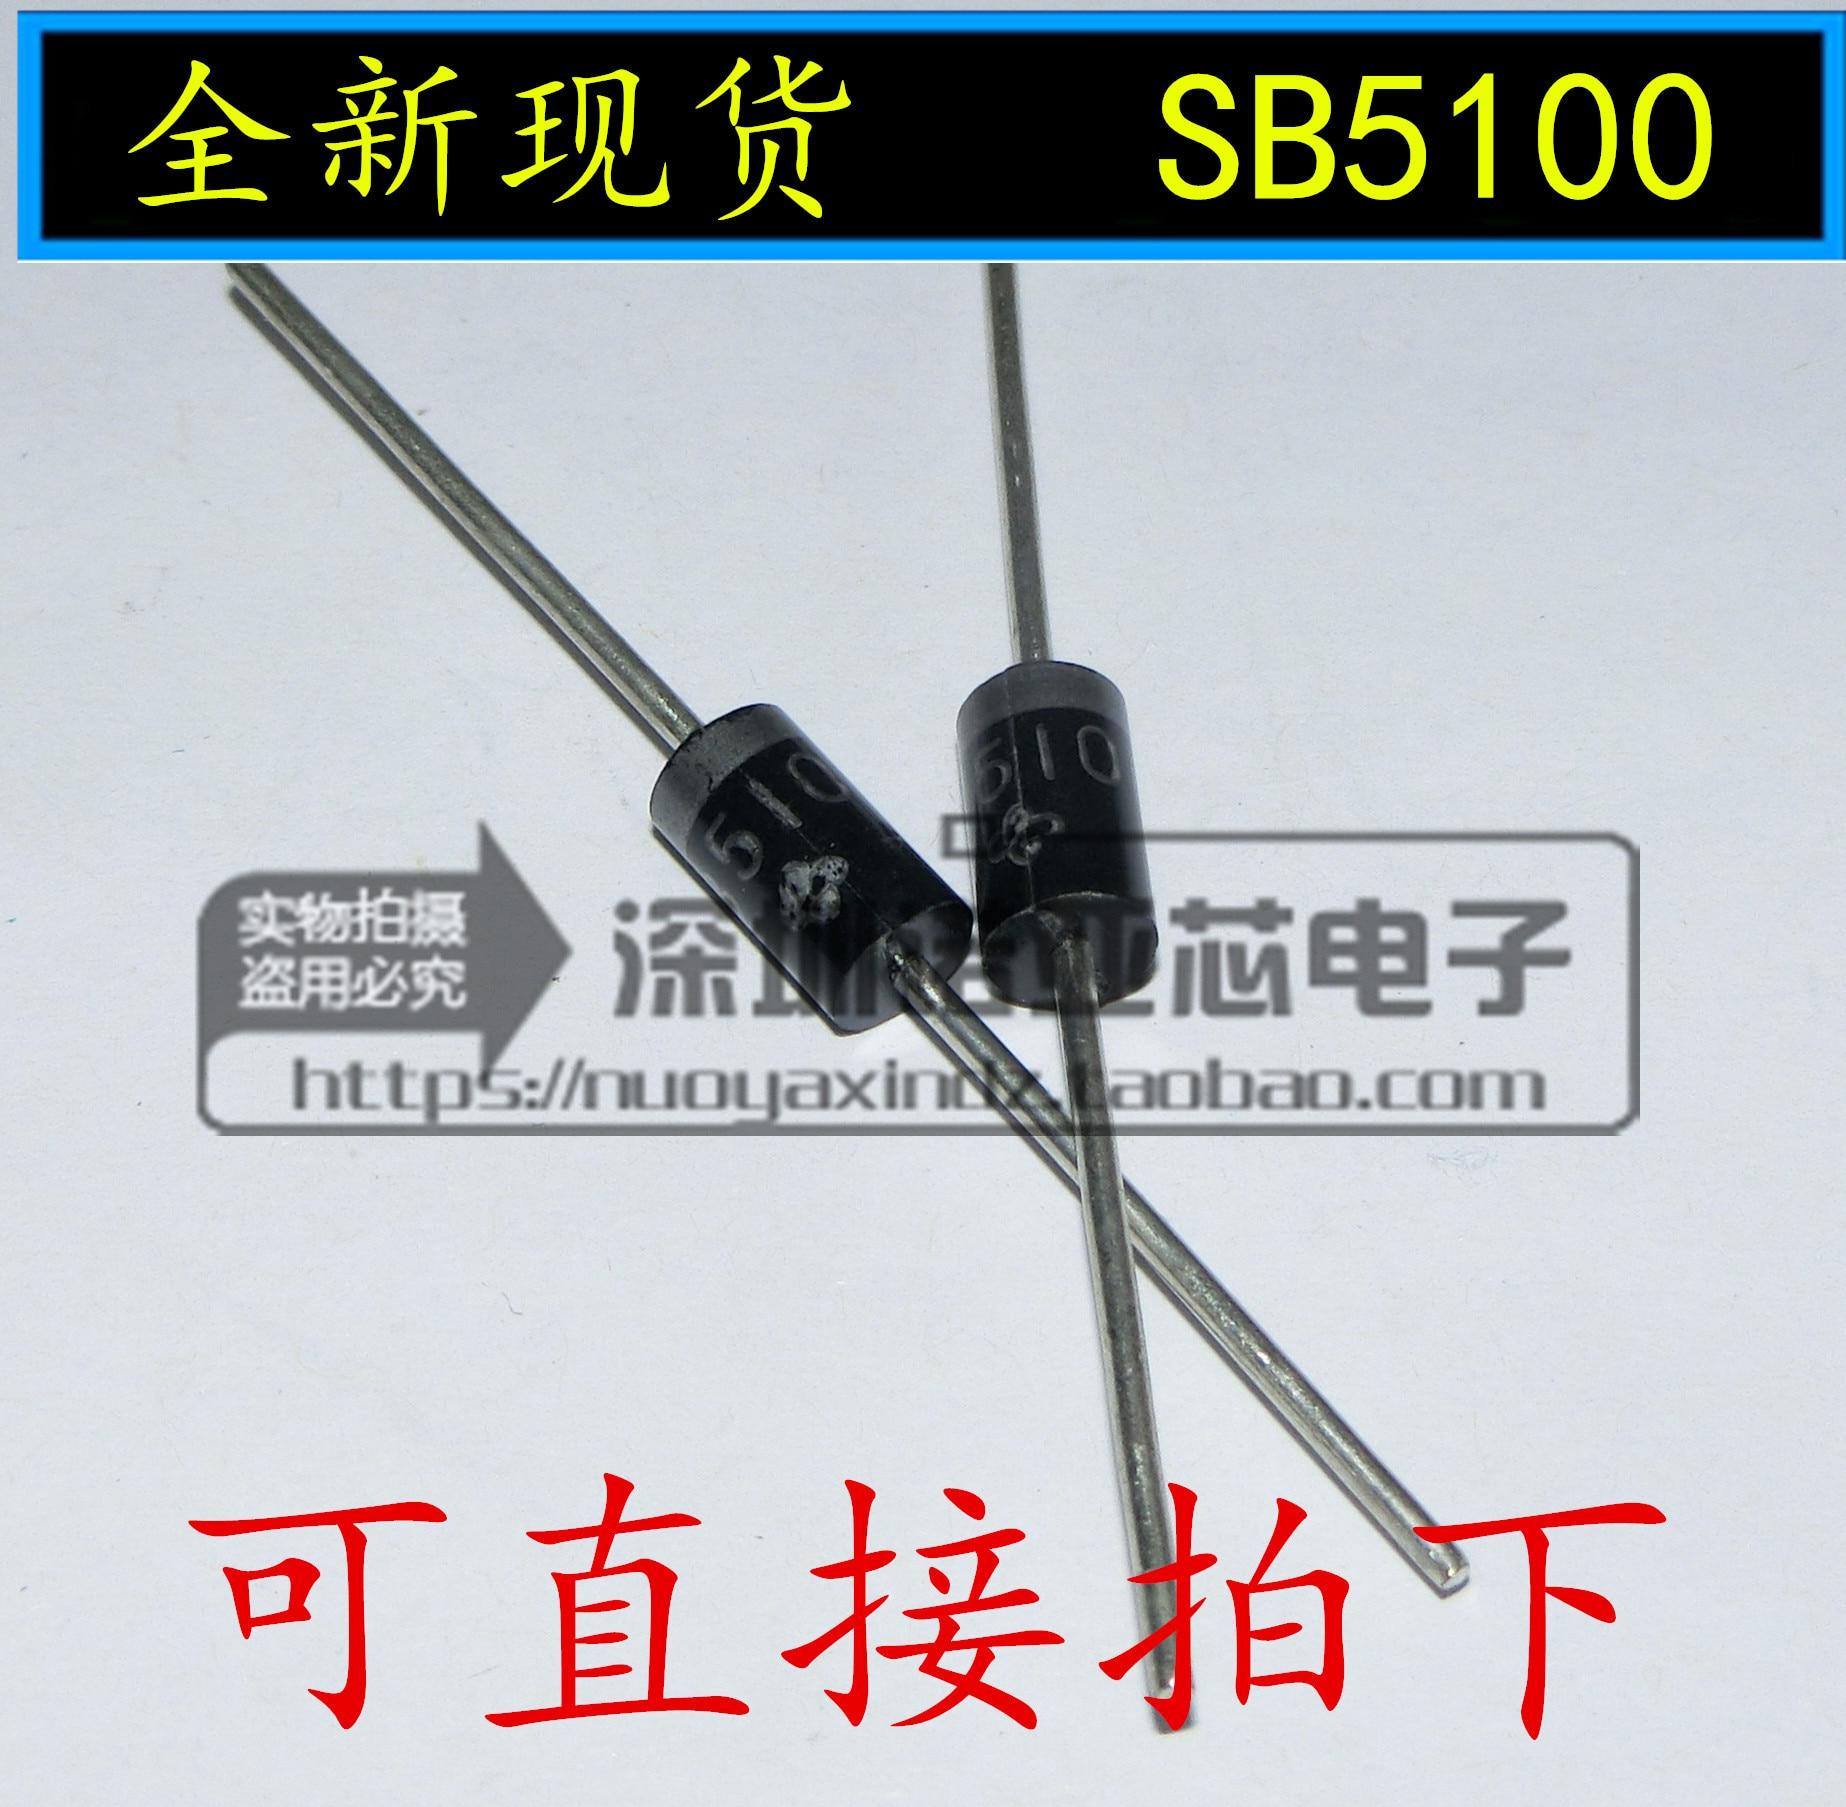 20 шт./лот SR5100 SB5100 5A 100V DO-27 в наличии